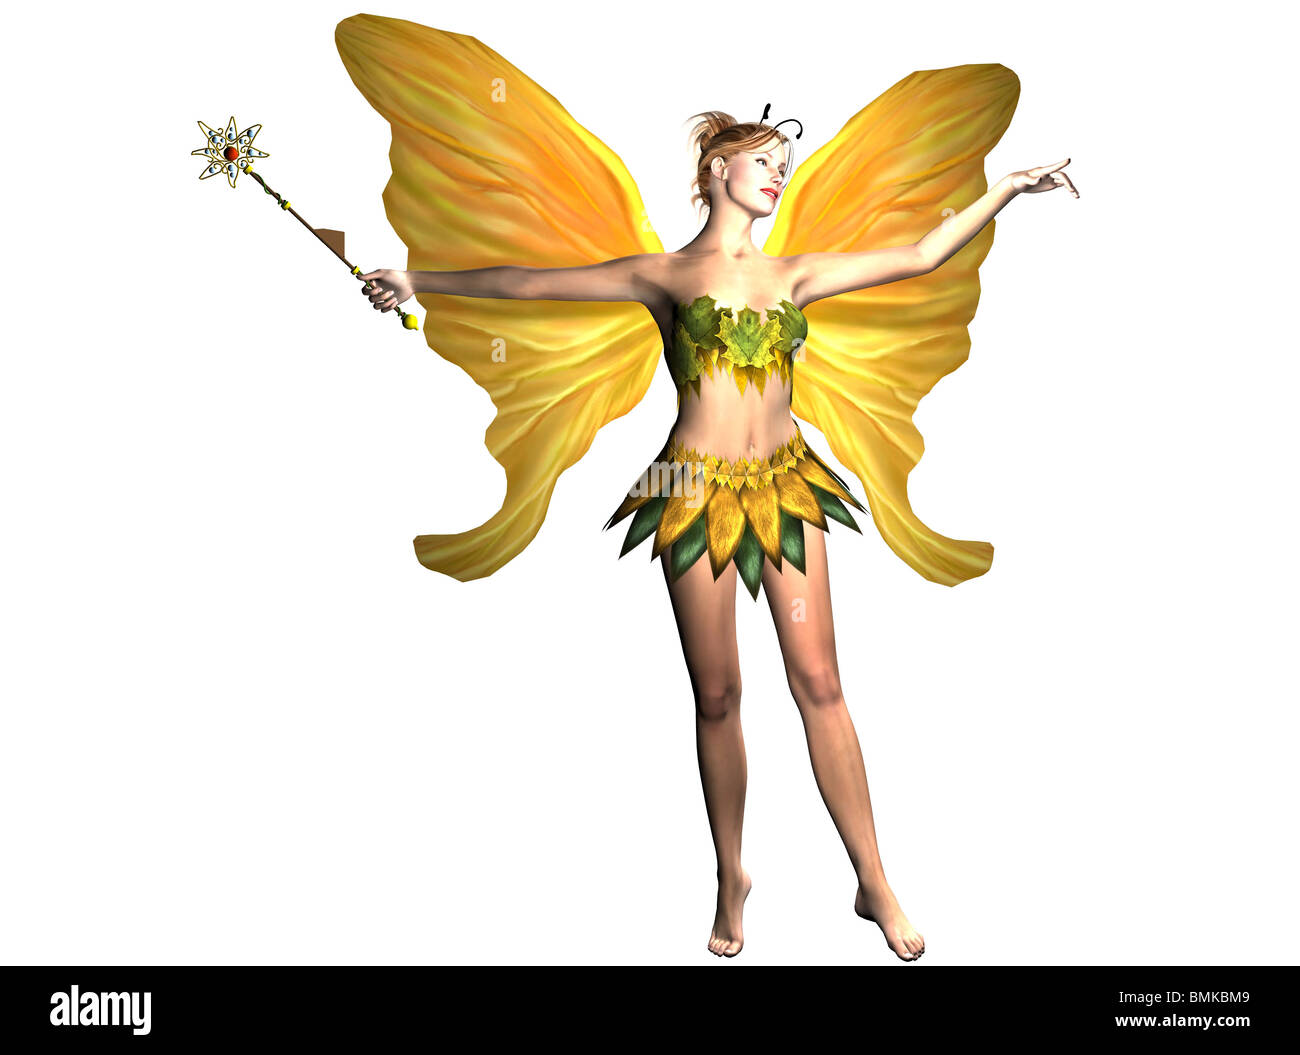 Fairy Photo Stock